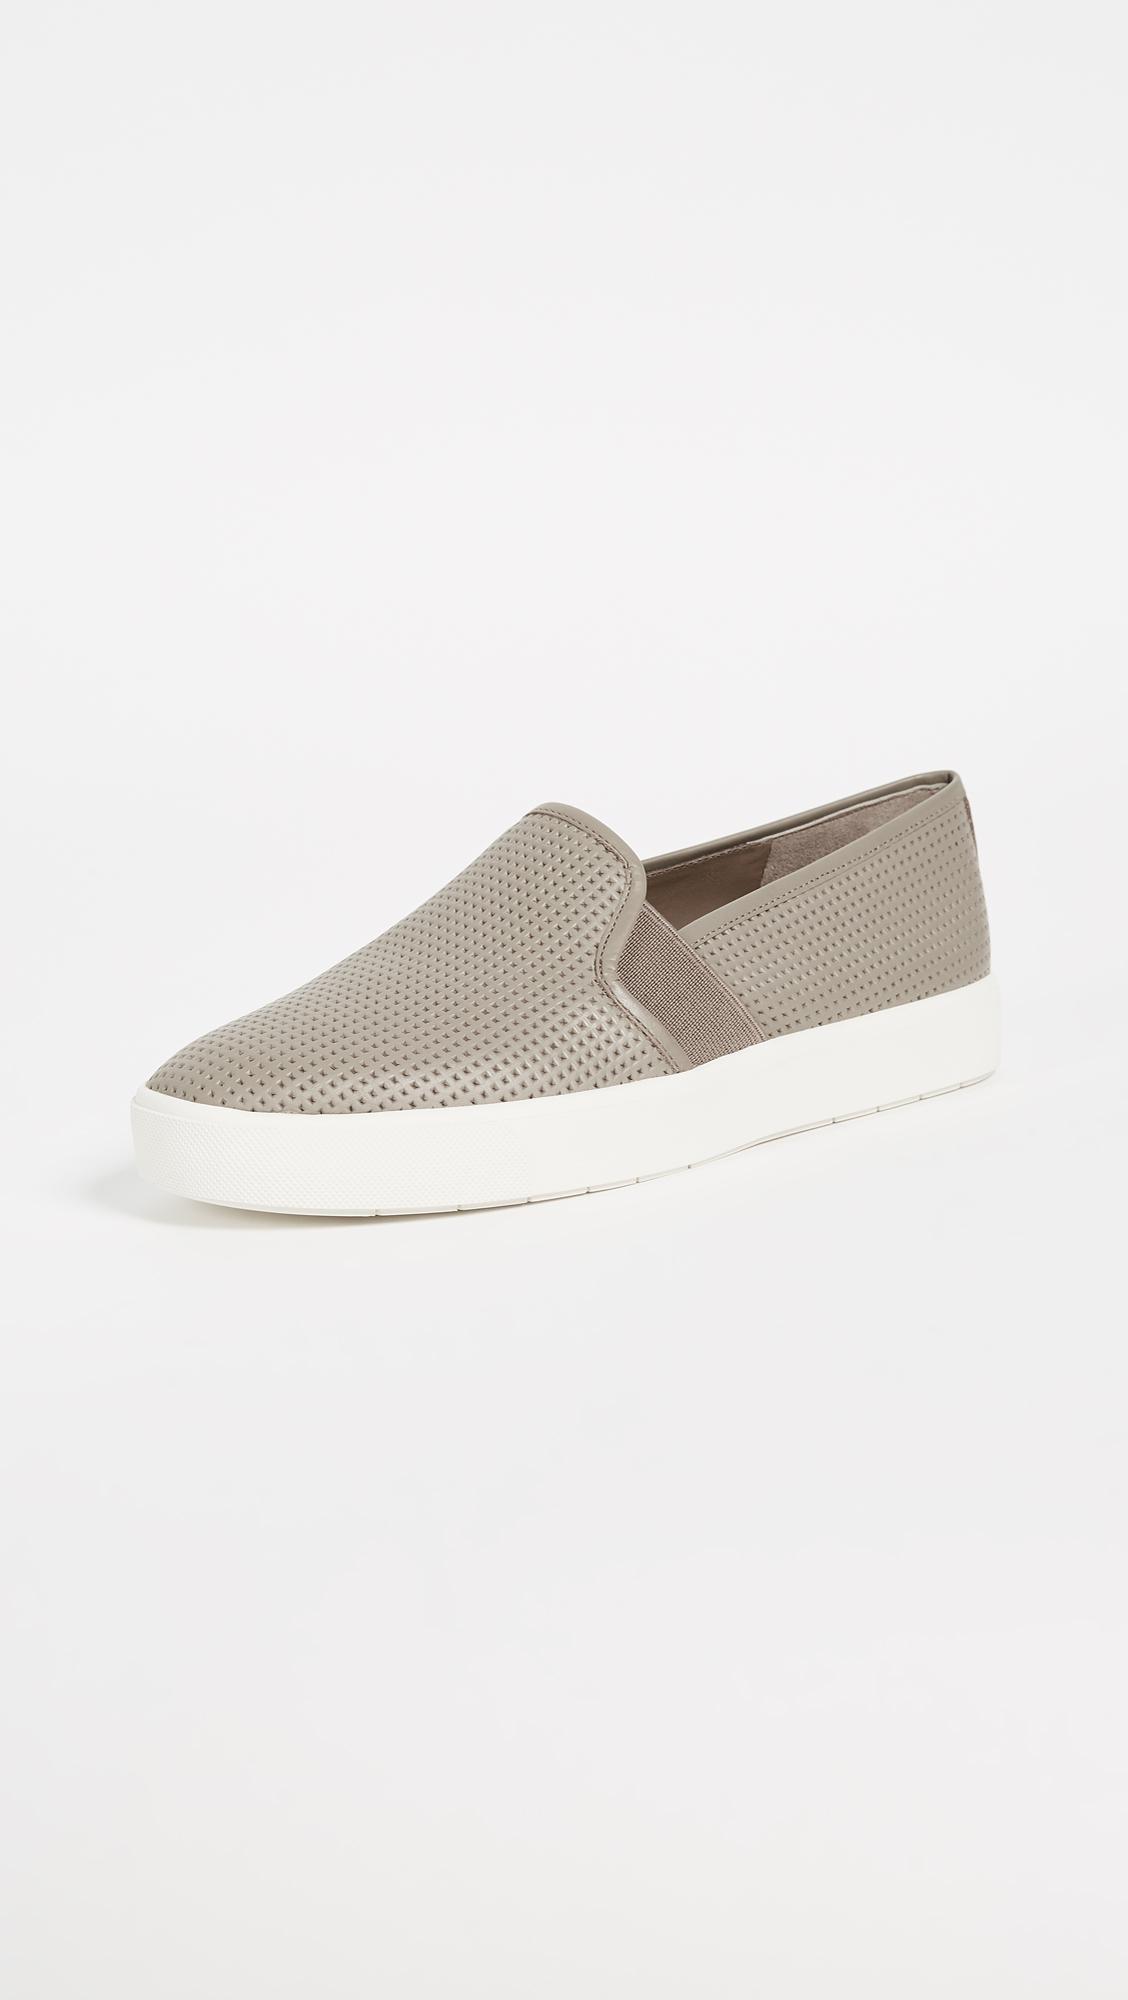 c1b7990b1e72c Lyst - Vince Blair Slip On Sneakers in Gray